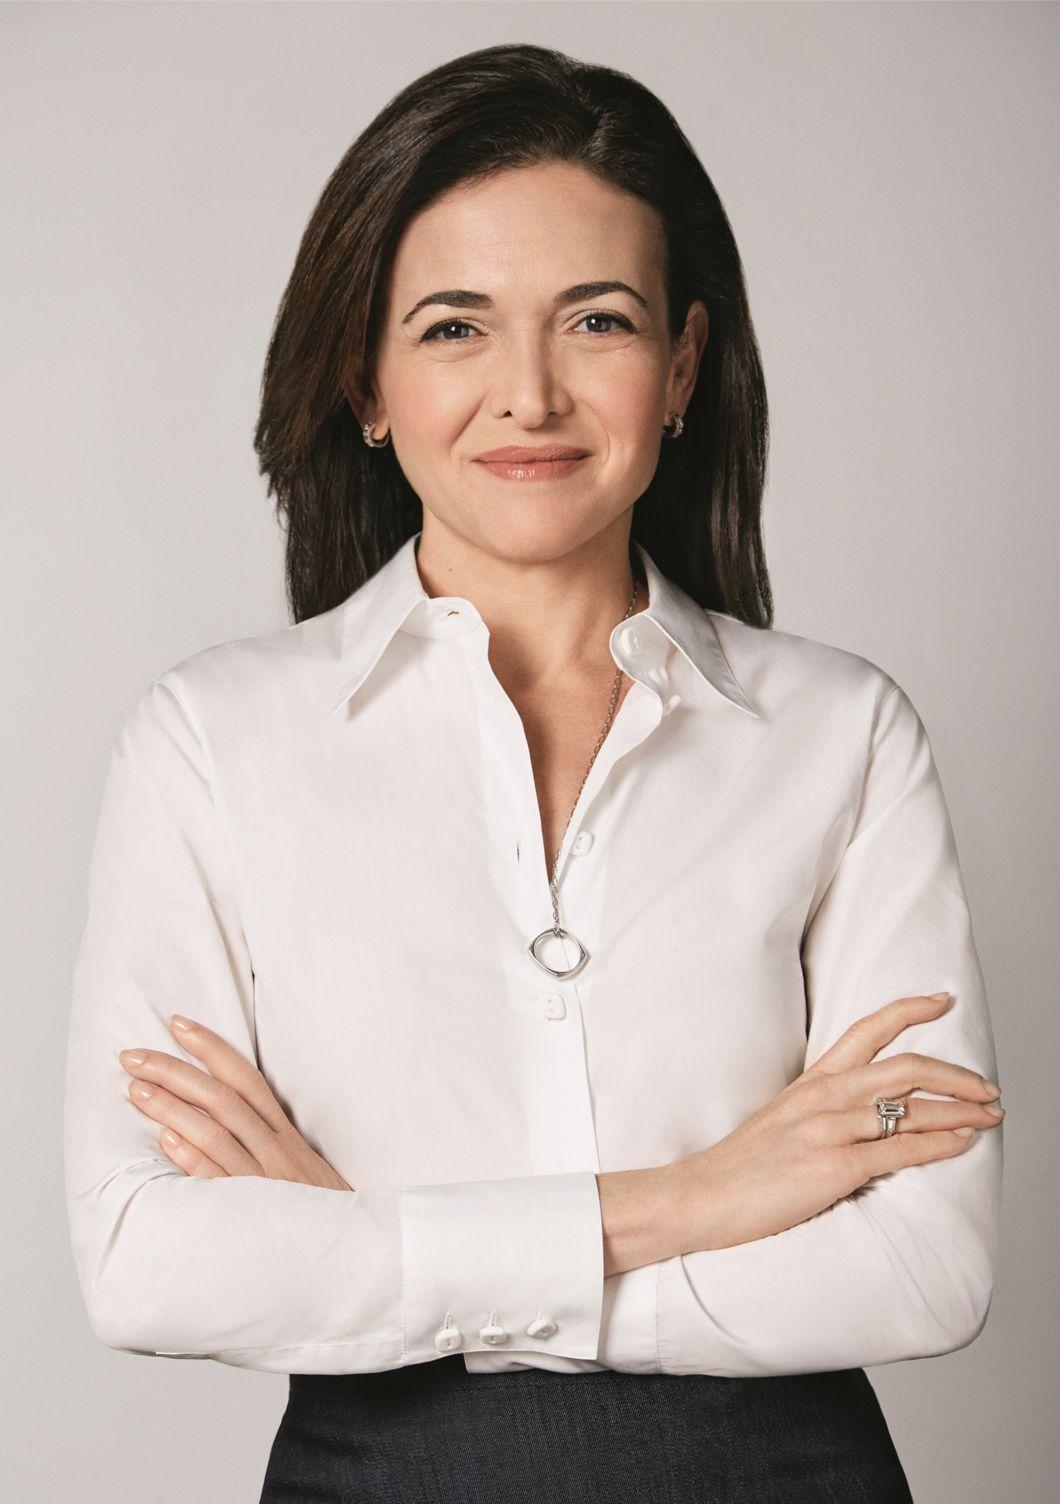 Sheryl Sandberg - COO of Facebook, founder of leanin.org